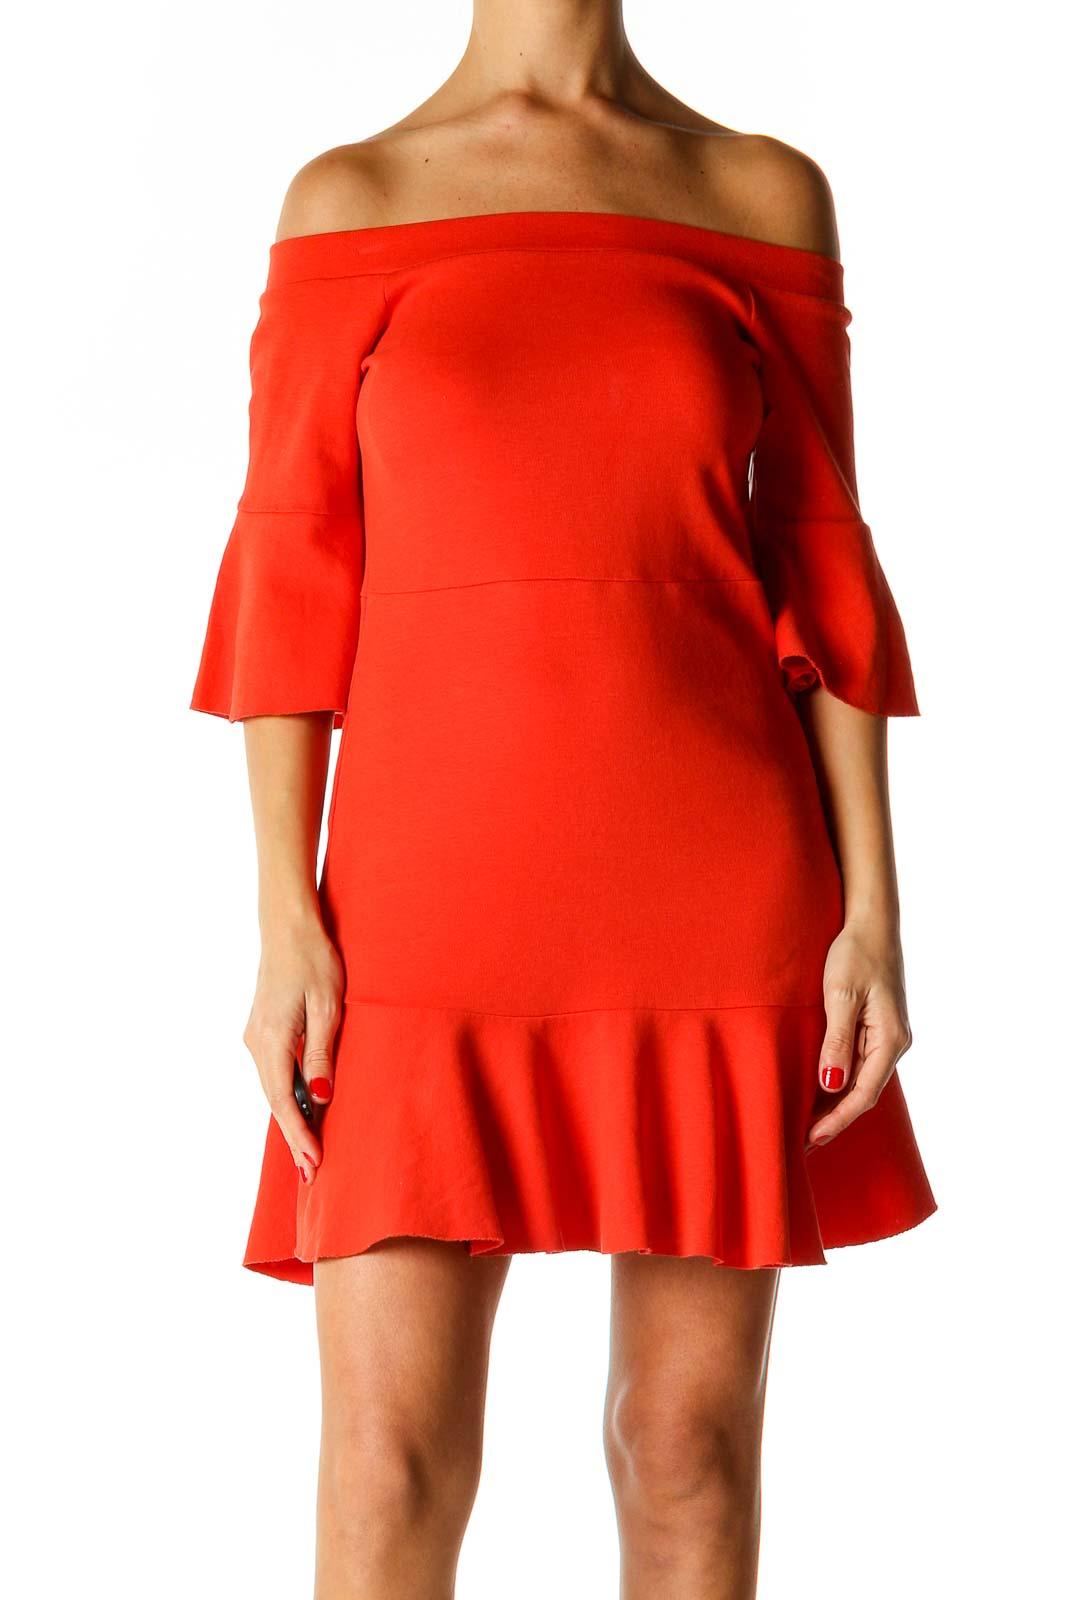 Orange Retro Flared Dress Front